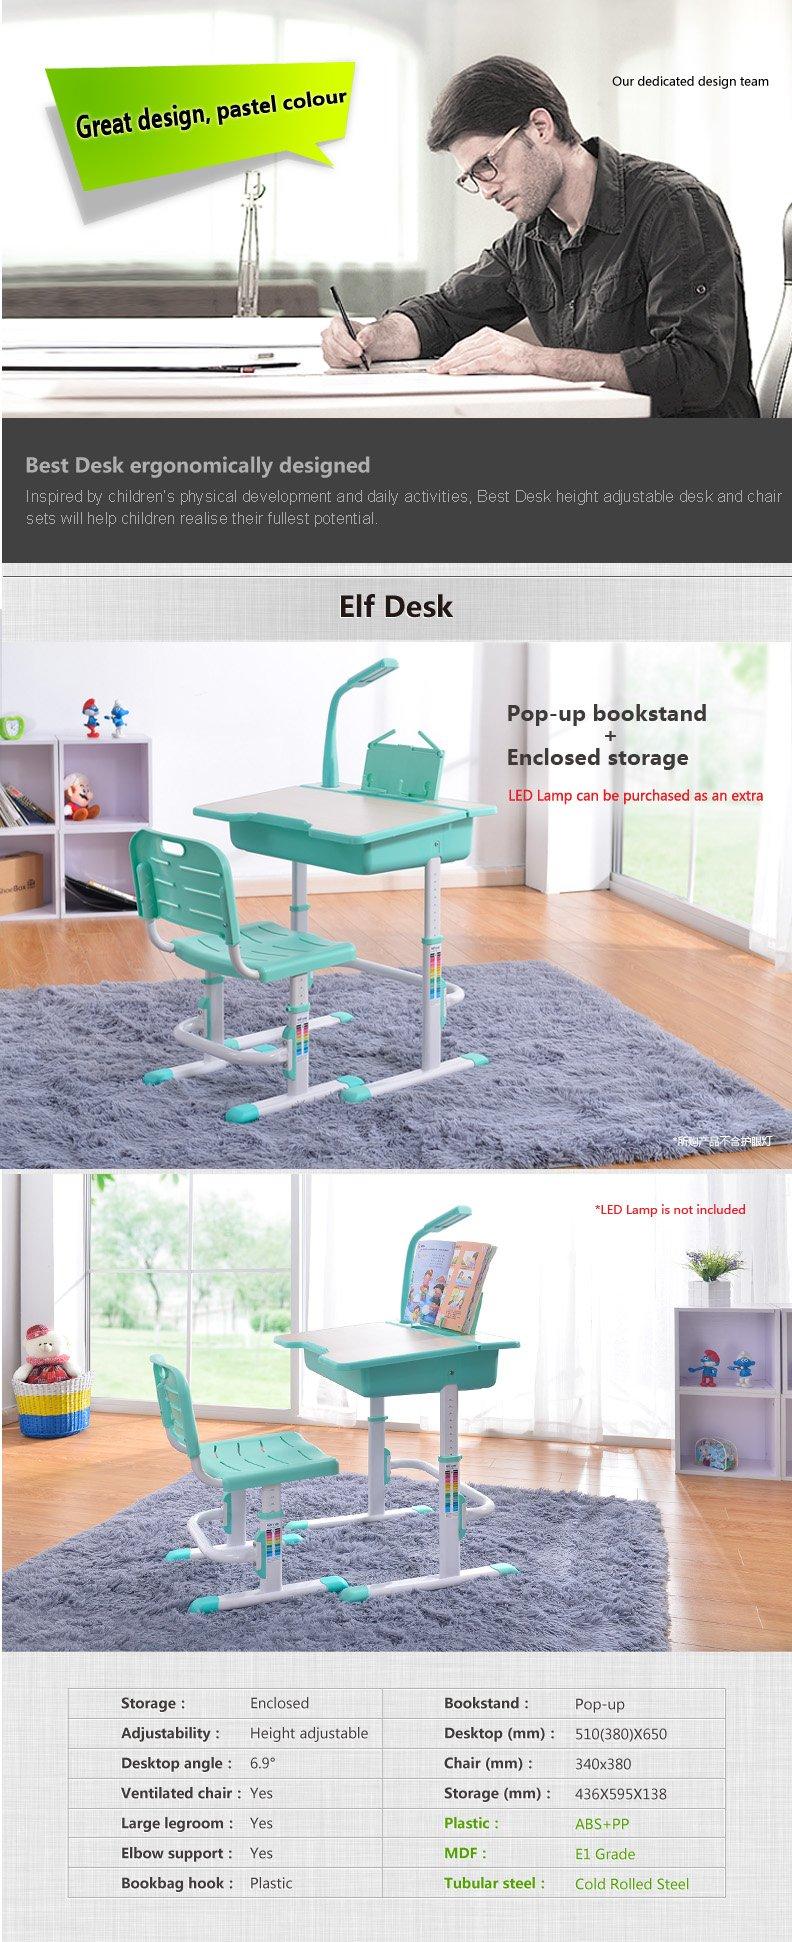 Best Desk kids adjustable desk chair Elf description 1